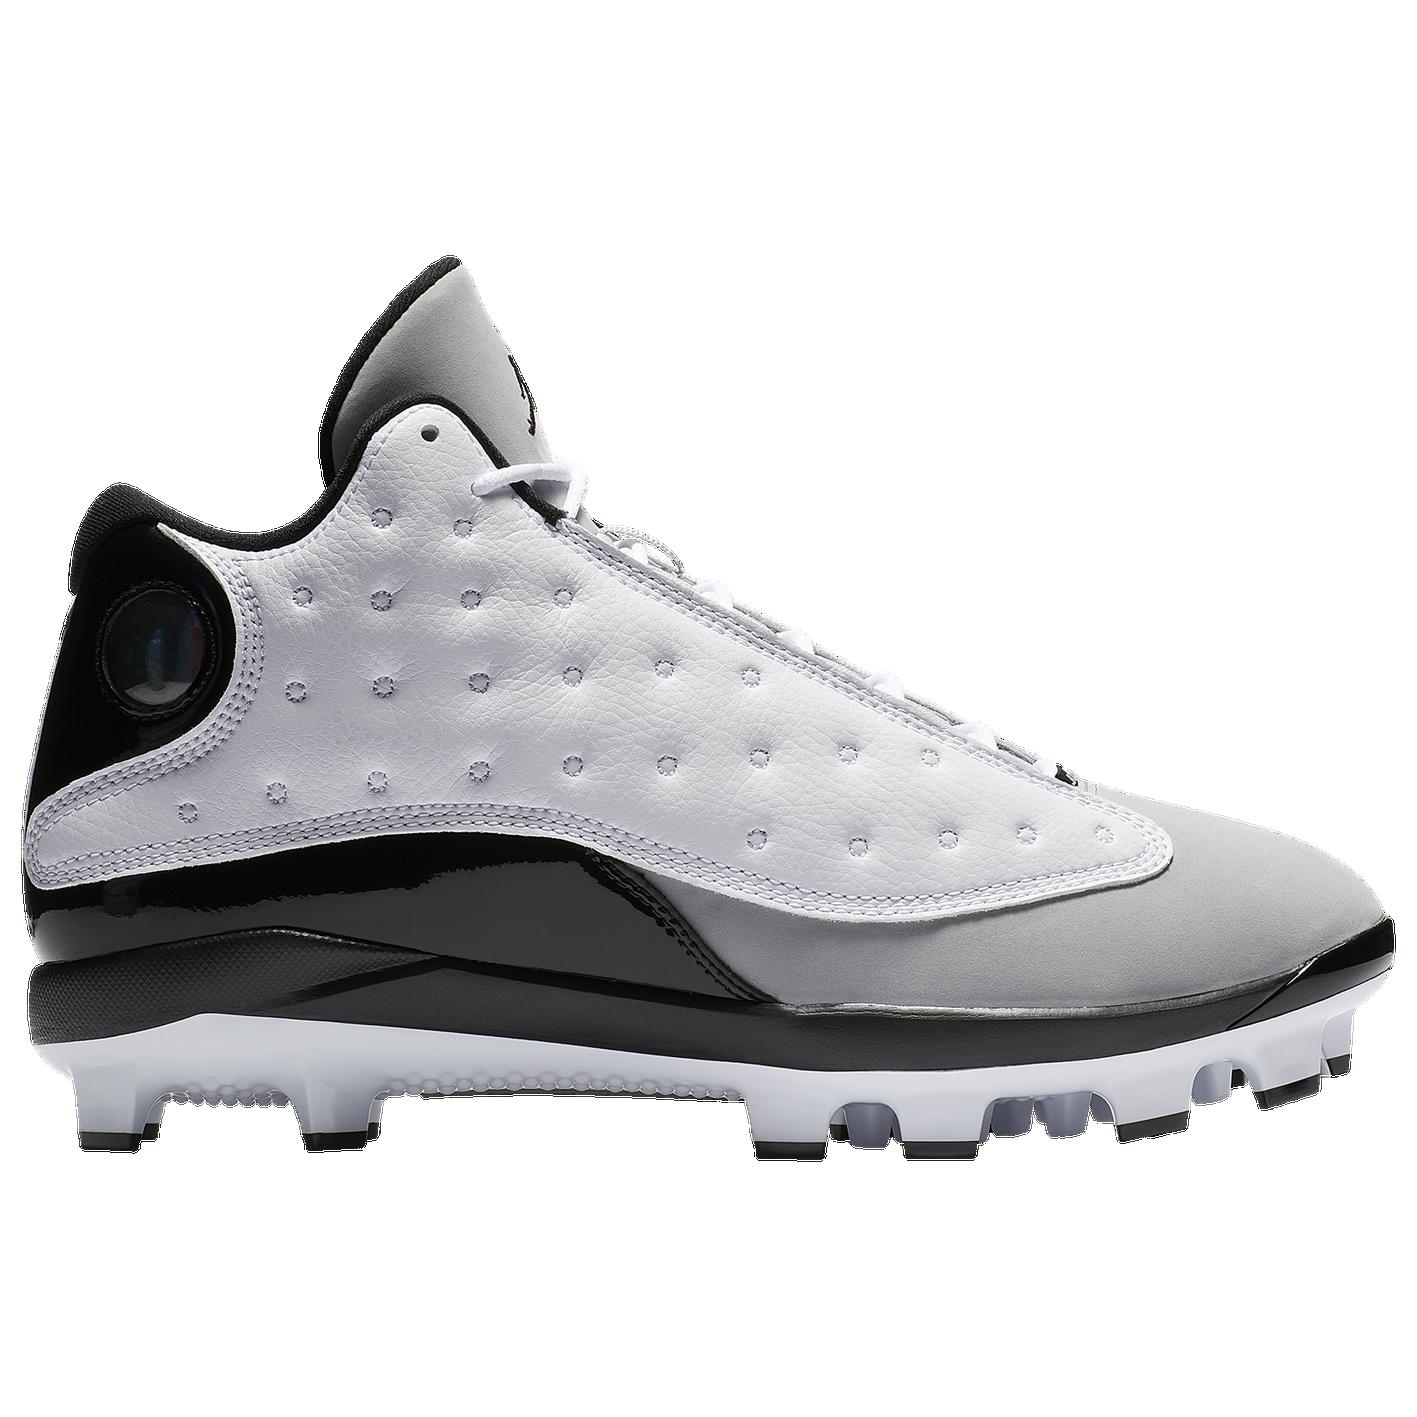 cf2e93c7b82 Jordan Retro 13 MCS - Men s - Baseball - Shoes - White Black Wolf Grey